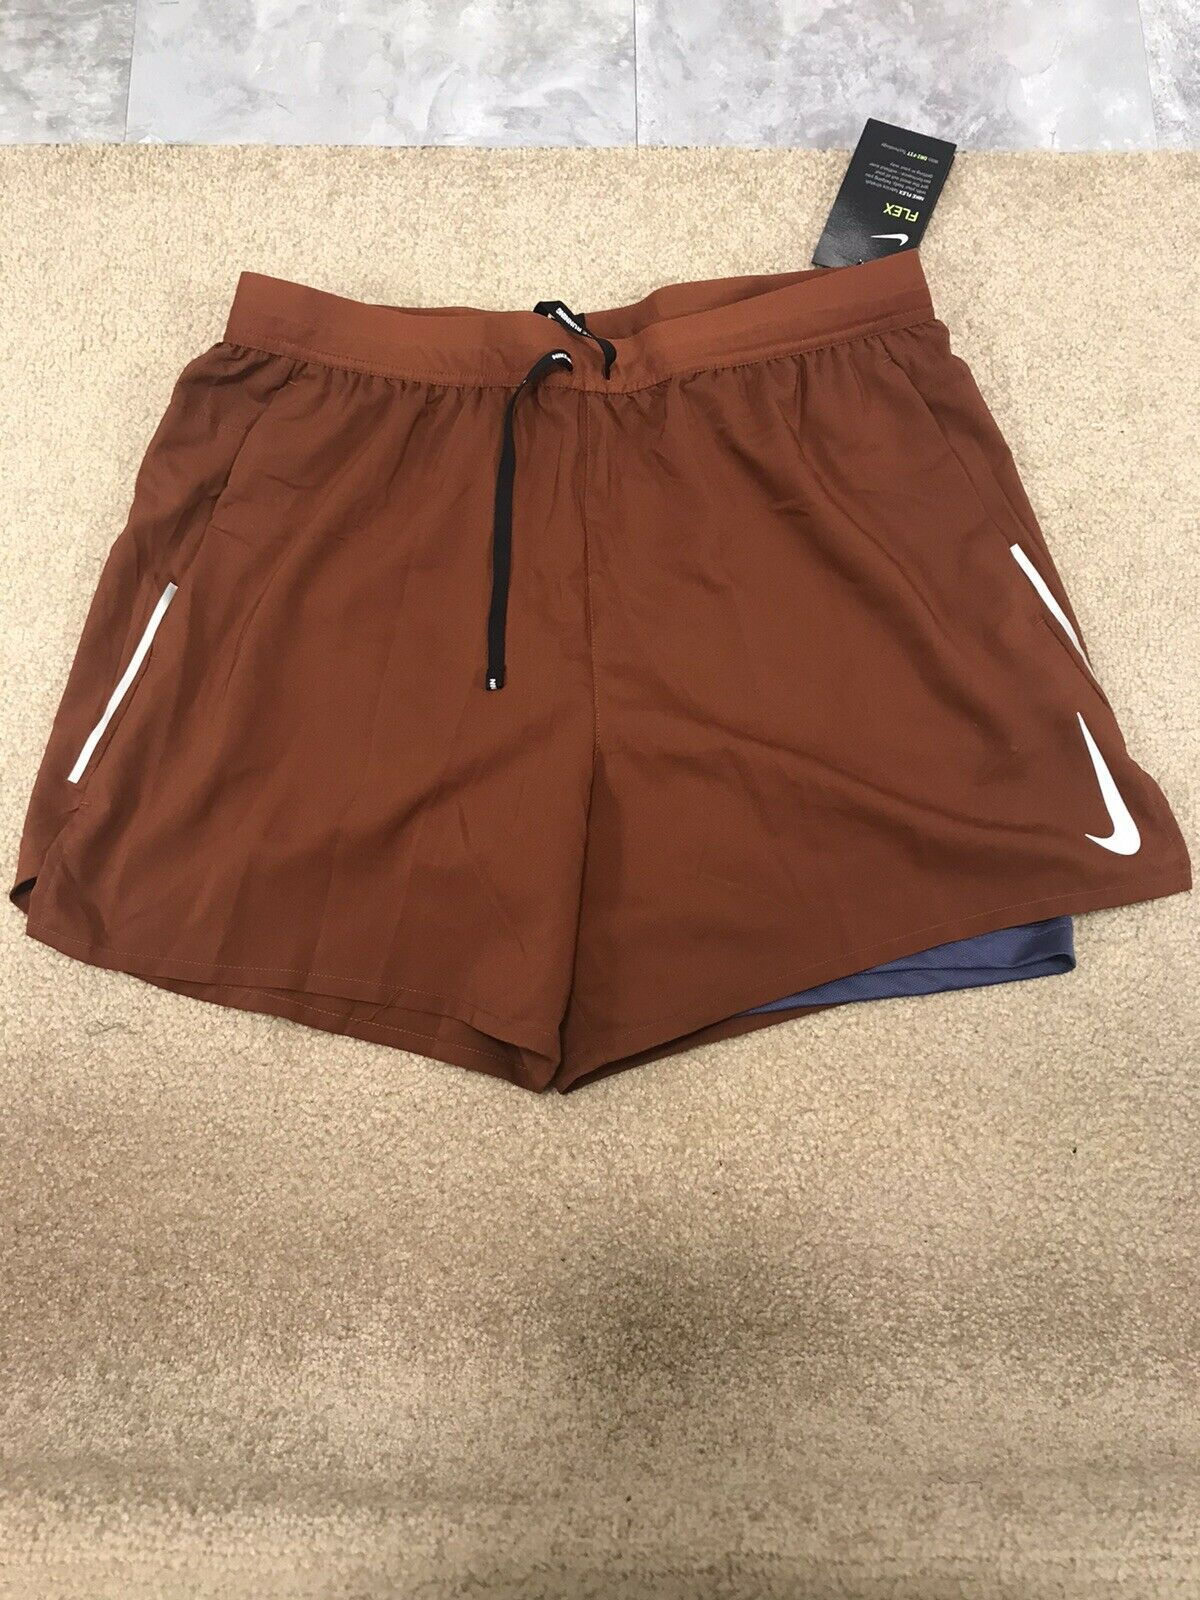 Escalera triángulo excitación  Mens Size Medium M Nike Flex Running Shorts 2 in 1 Green Gray Aj7782-323 for  sale online   eBay